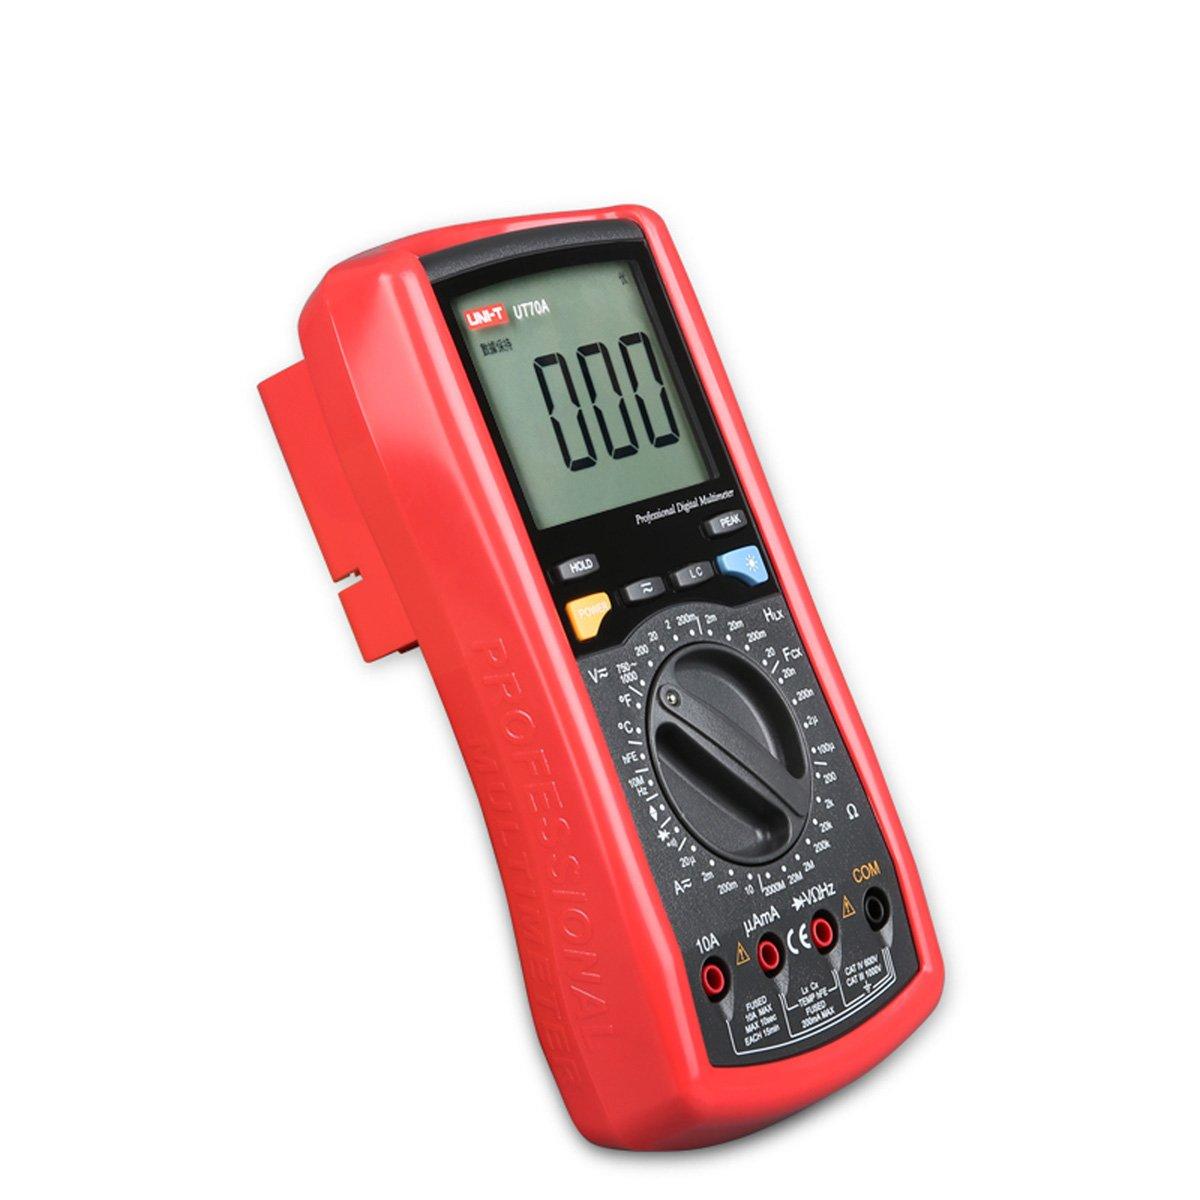 Uni-t UT70A UT-70A Modern Digital Multi-purpose Multimeter Multimetro AC / DC Temperatura de Diodo Transistor - - Amazon.com